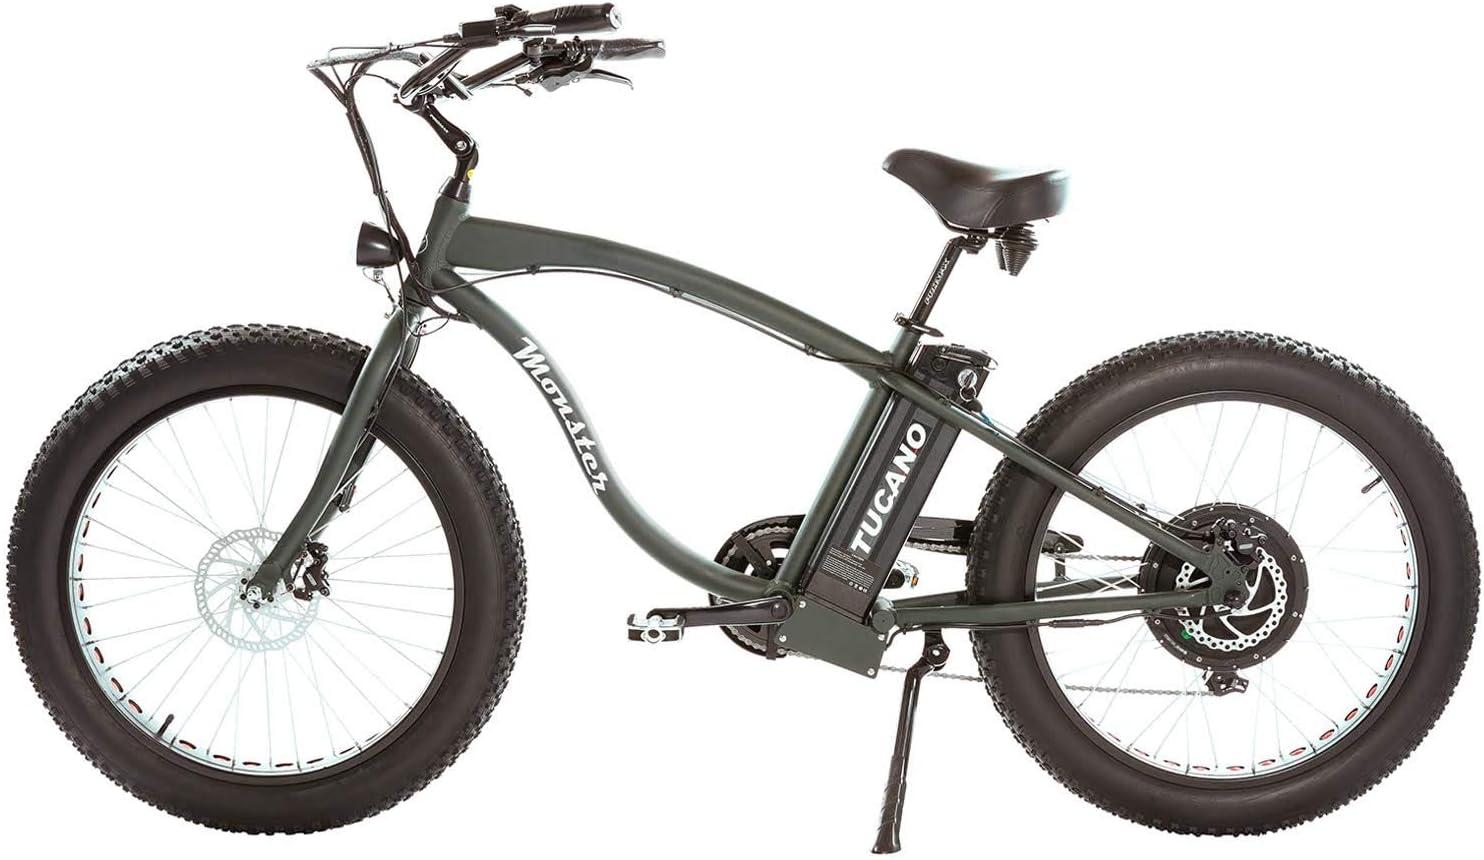 Tucano Monster 26 Naked (Verde). Bicicleta eléctrica 26